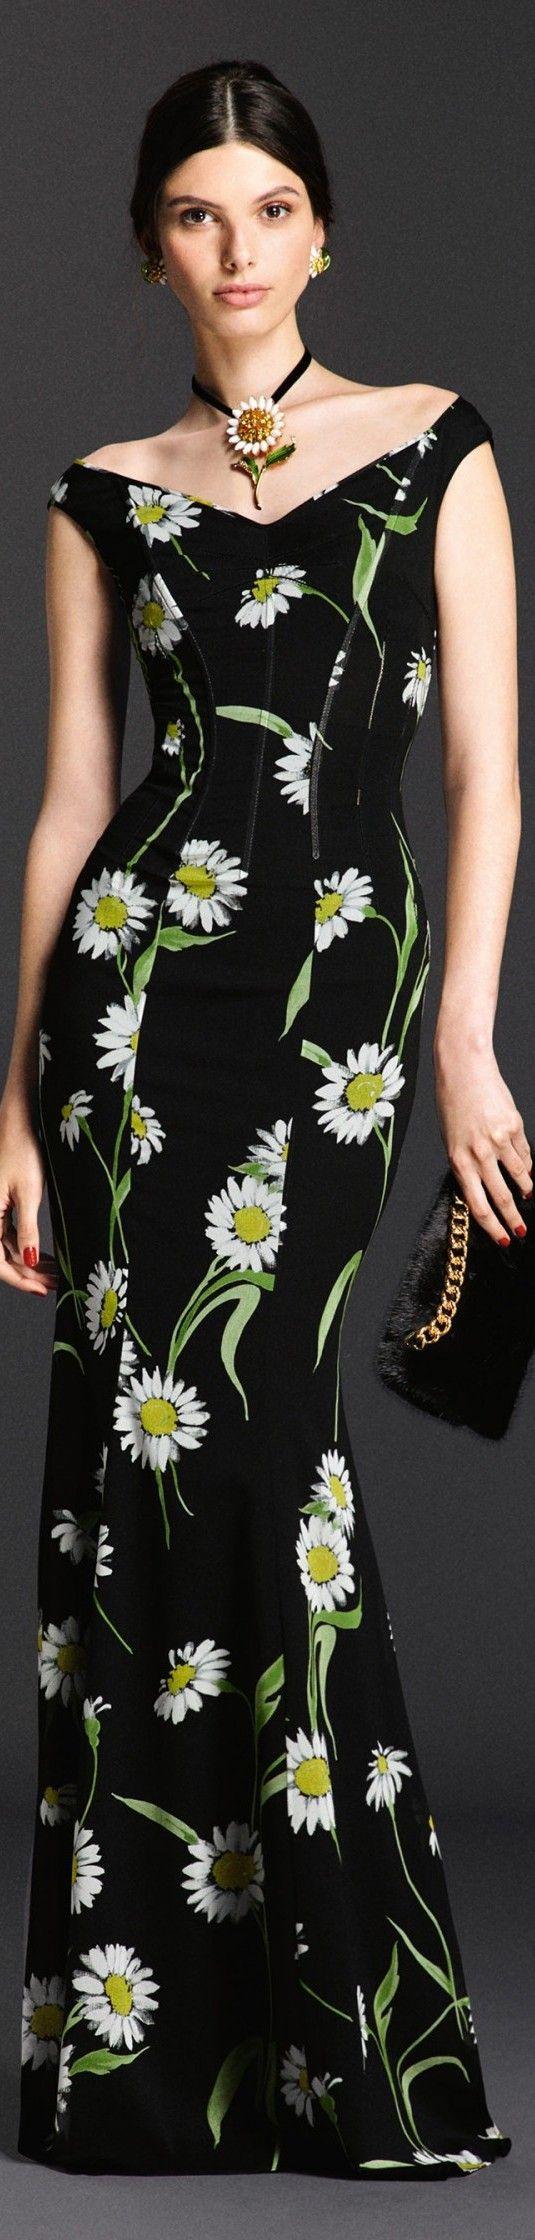 Dolce and Gabbana Summer - 2016                                                                                                                                                      Más